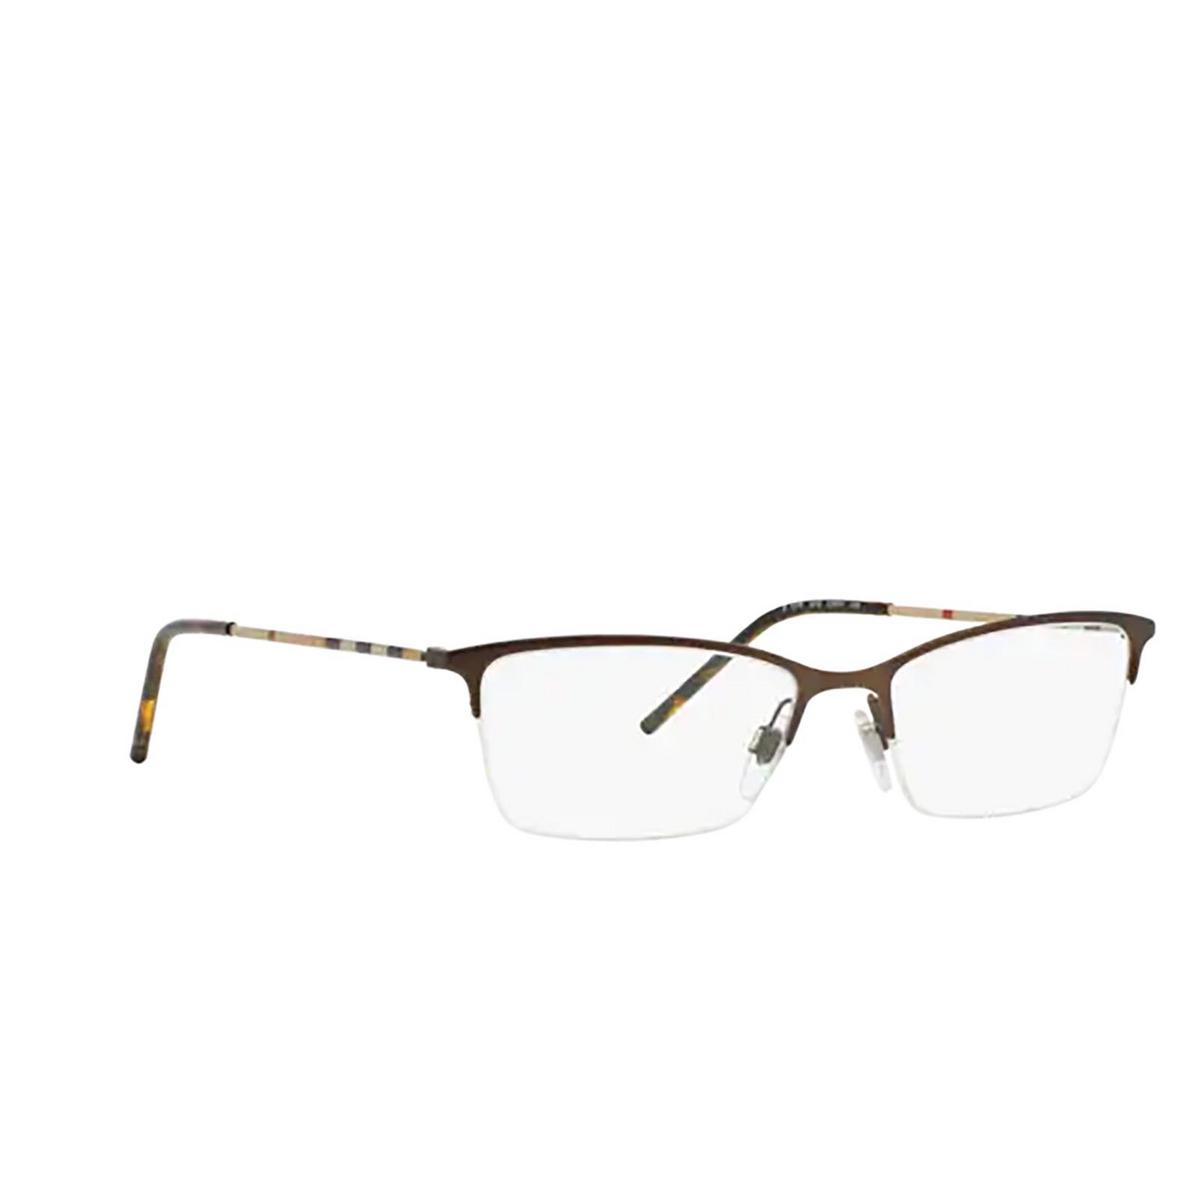 Burberry® Cat-eye Eyeglasses: BE1278 color Matte Brown 1012 - three-quarters view.